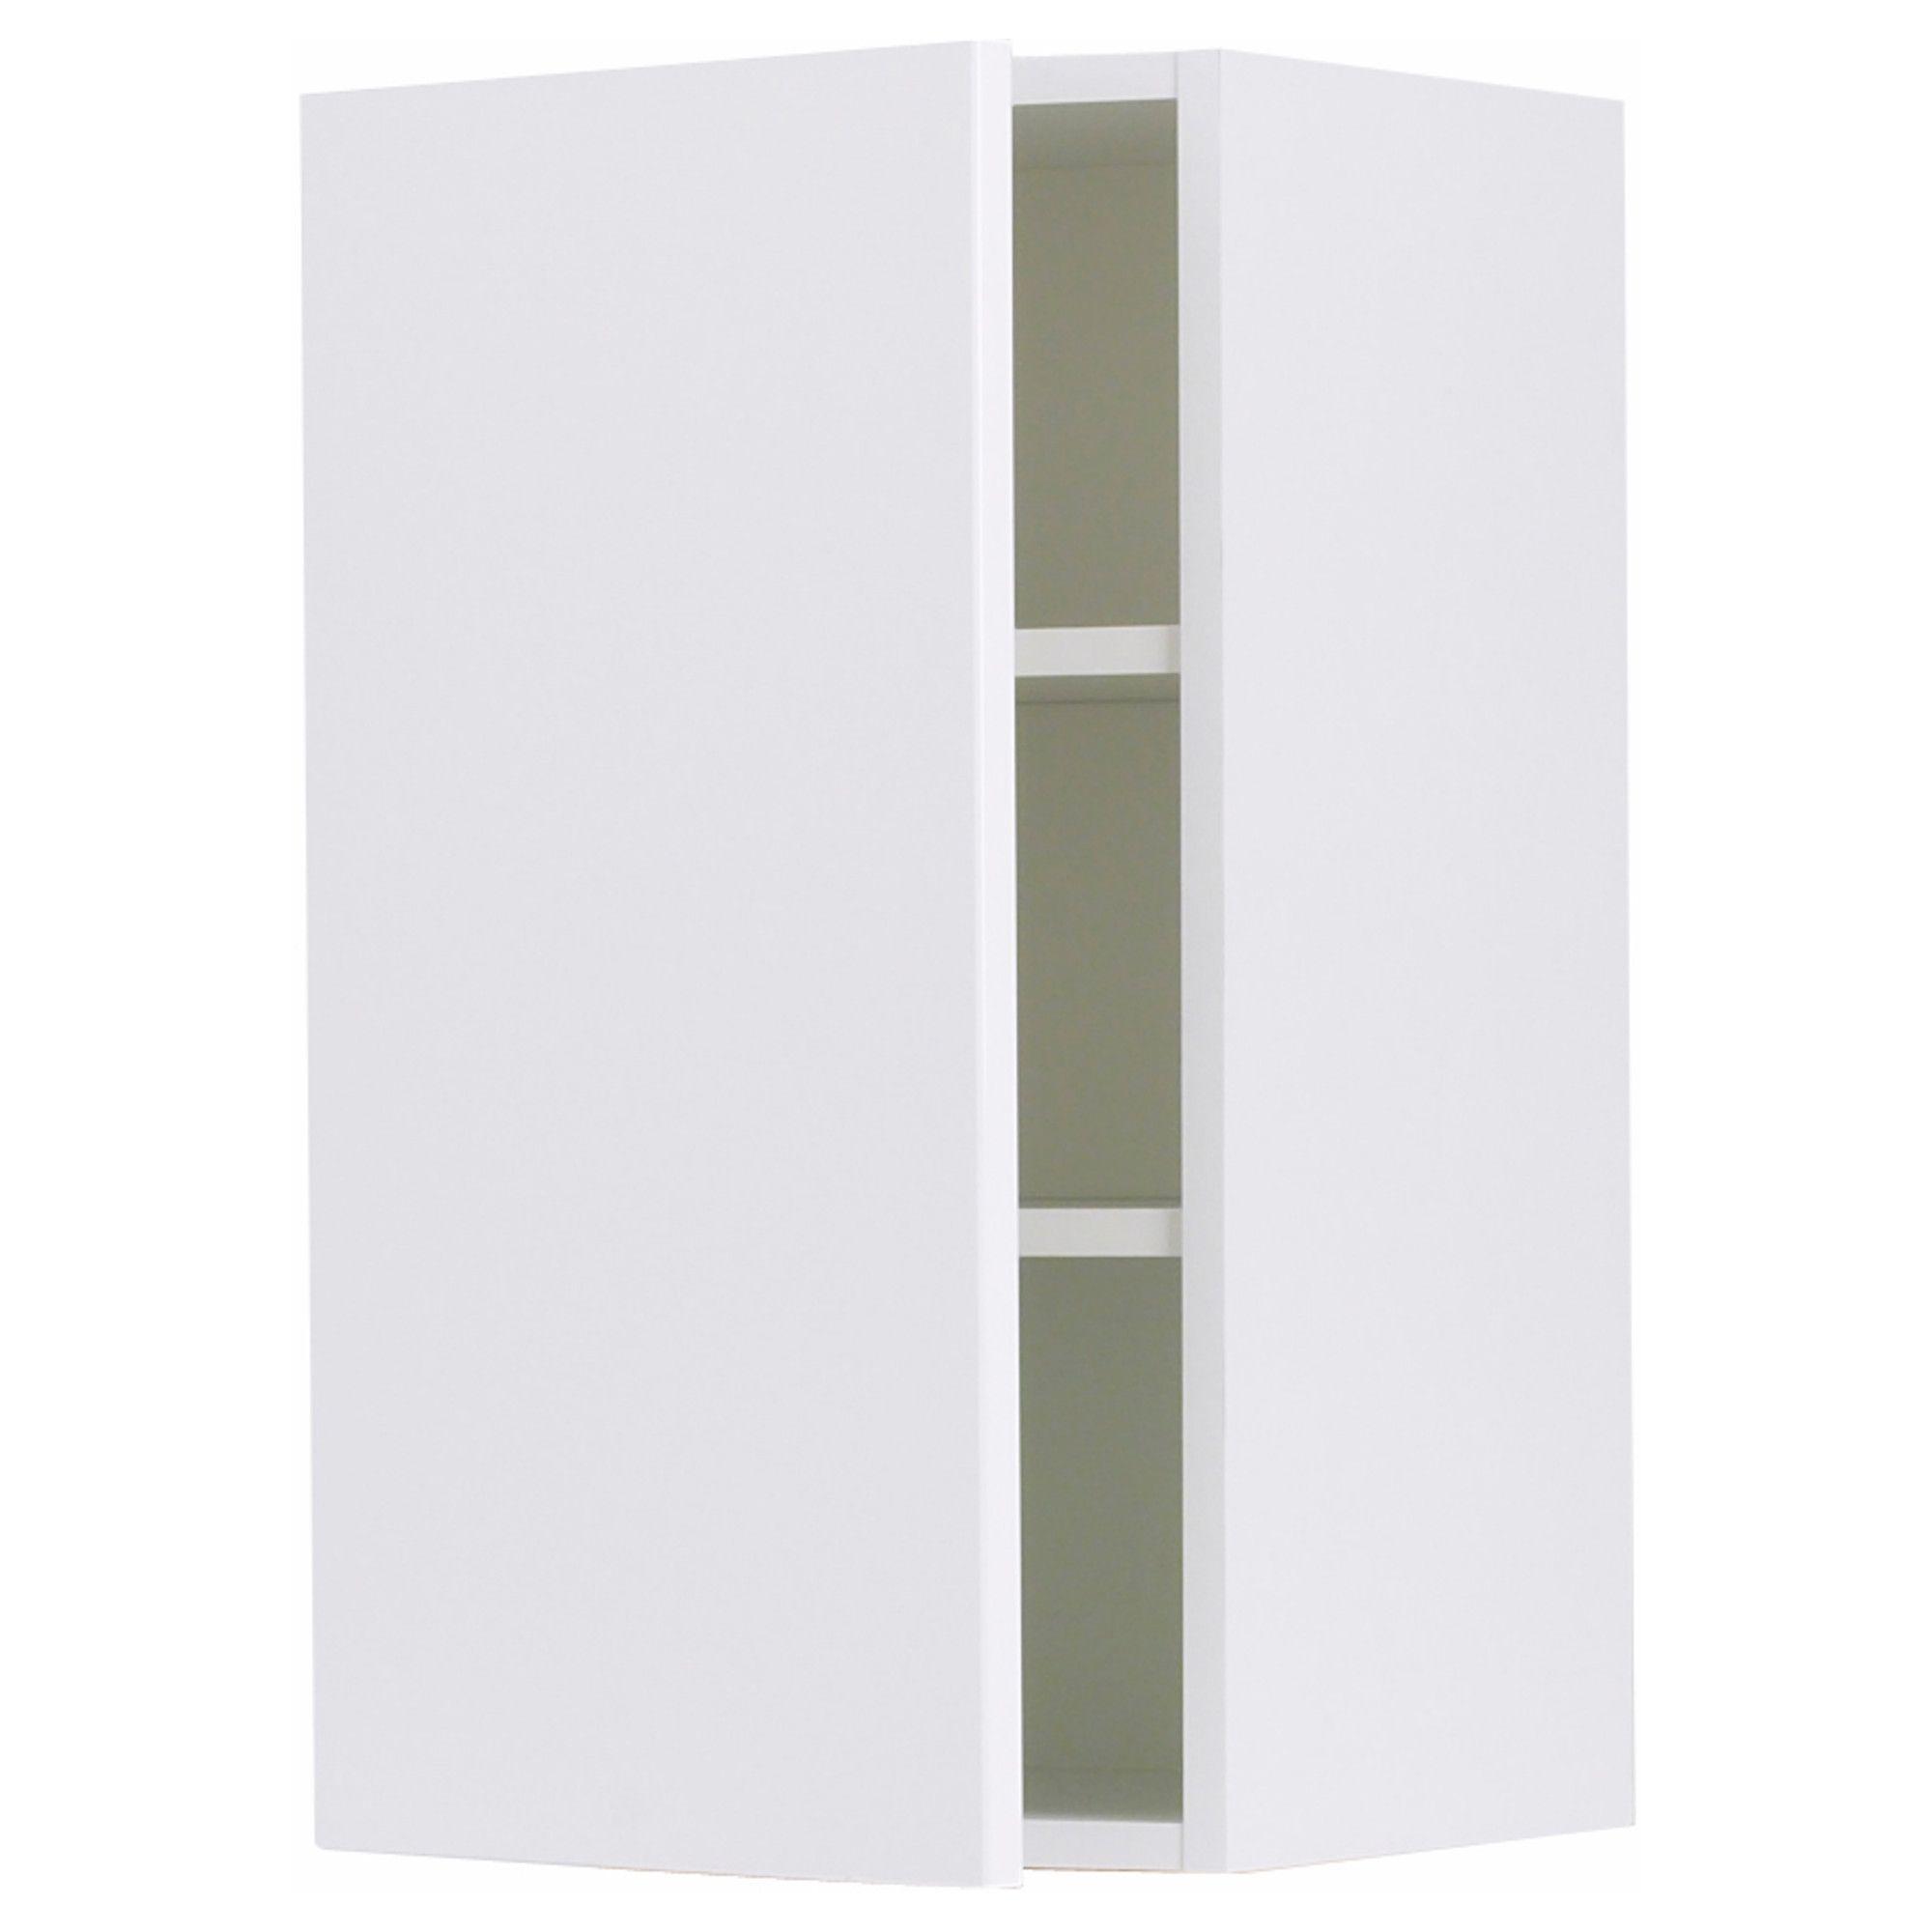 faktum wall cabinet - abstrakt white, 30x70 cm - ikea £42